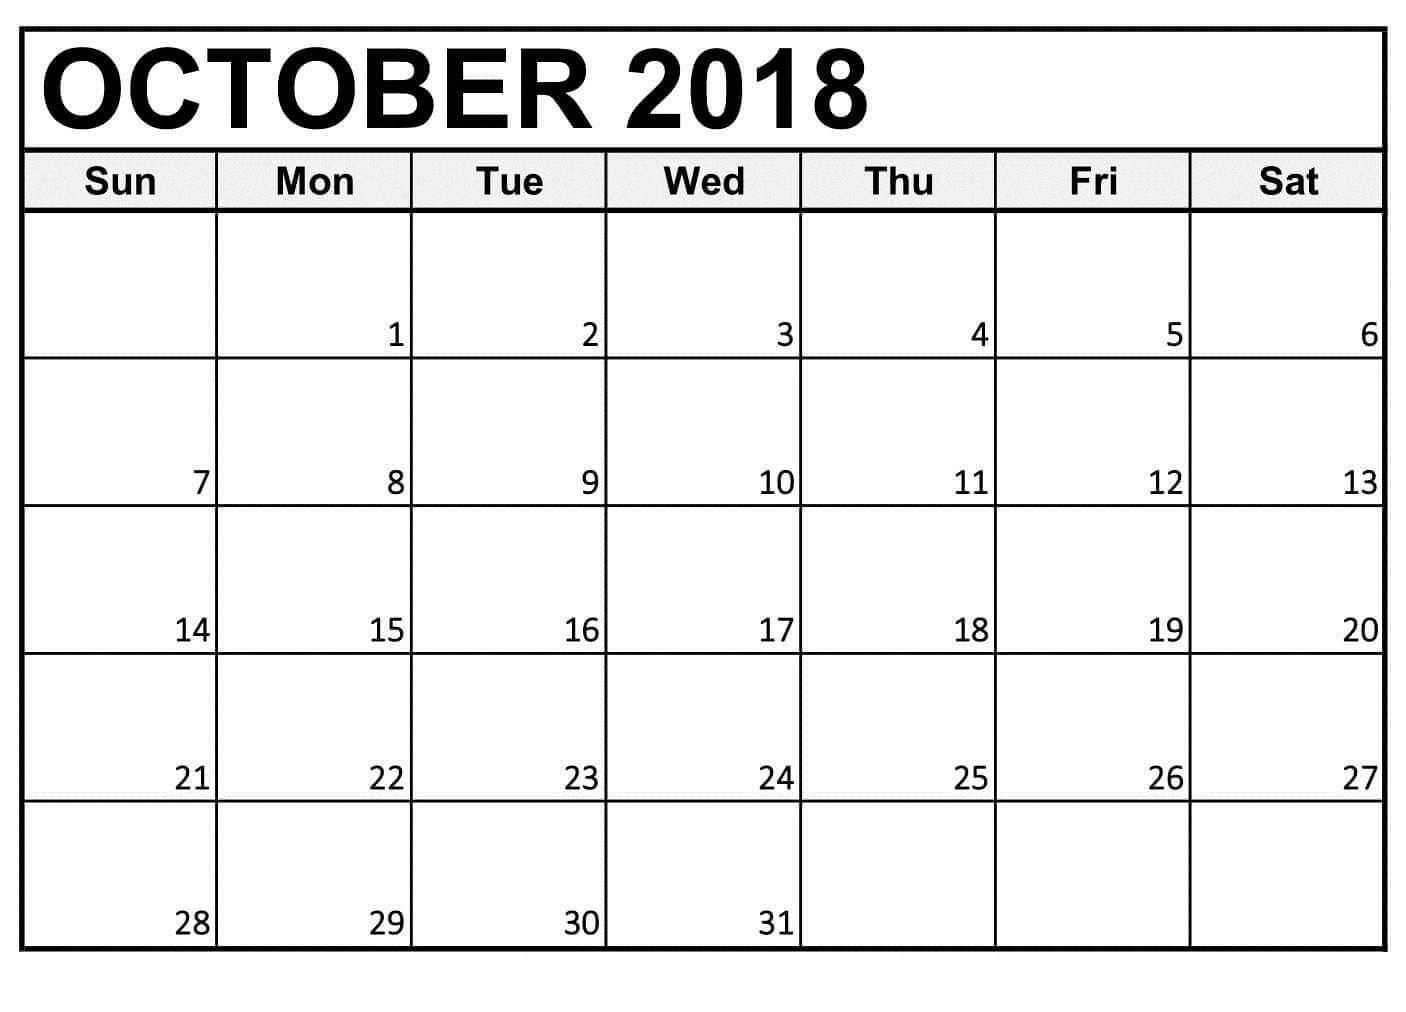 Free Printable Calendar October 2018 Large Numbers | Calendar Printables, Printable Calendar